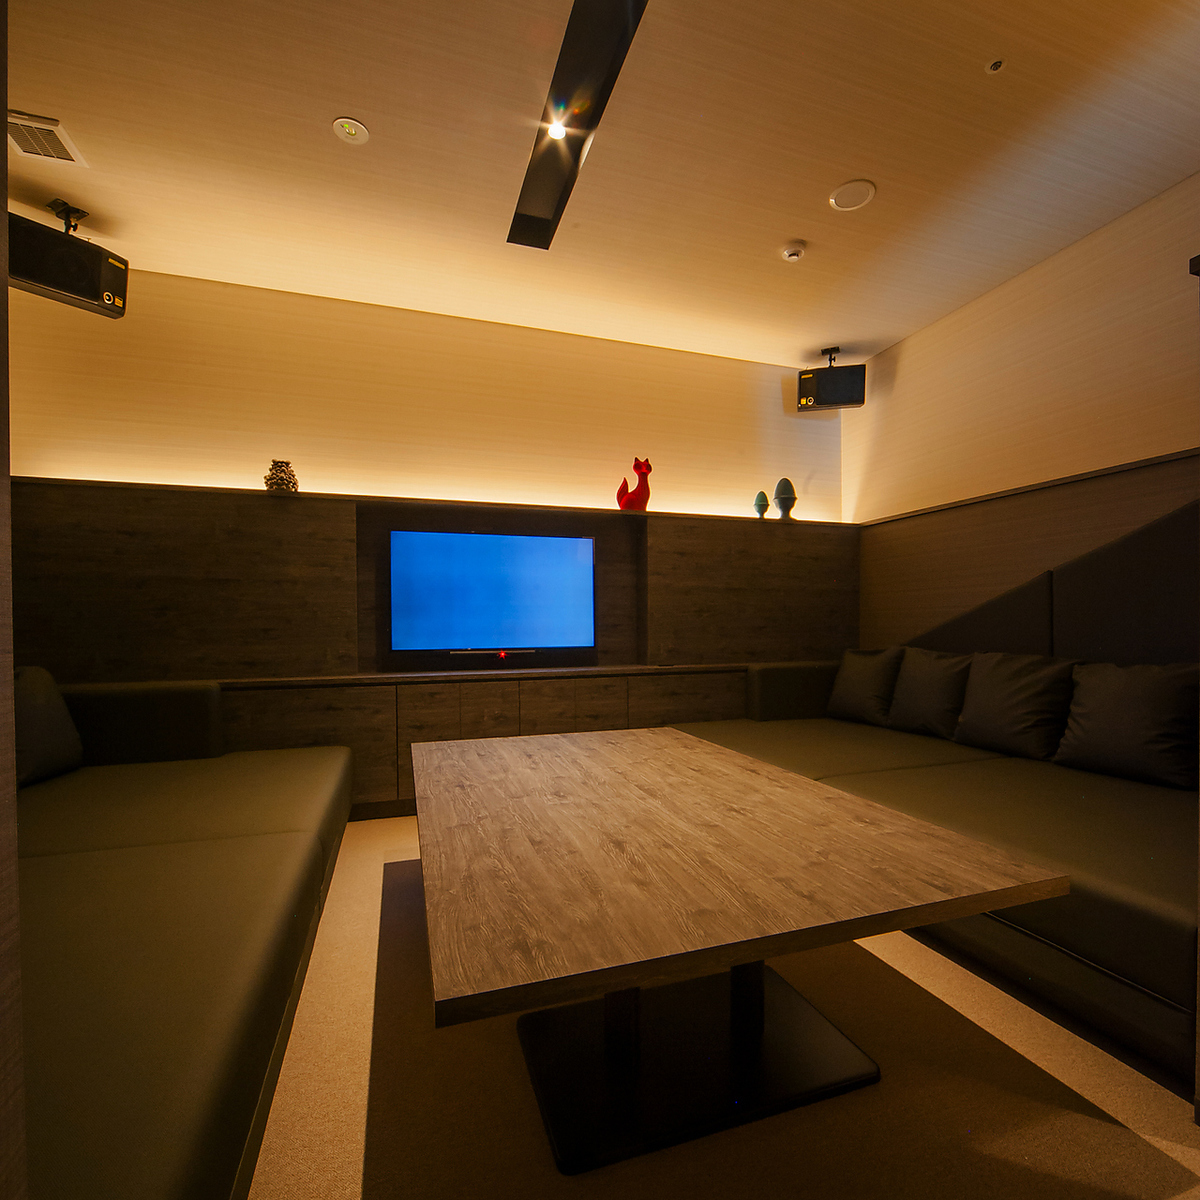 【ROOM 006】私人房間最多可容納6人/床沙發,寬敞典雅,現代混合。非常適合用作卡拉OK或私人休息室。